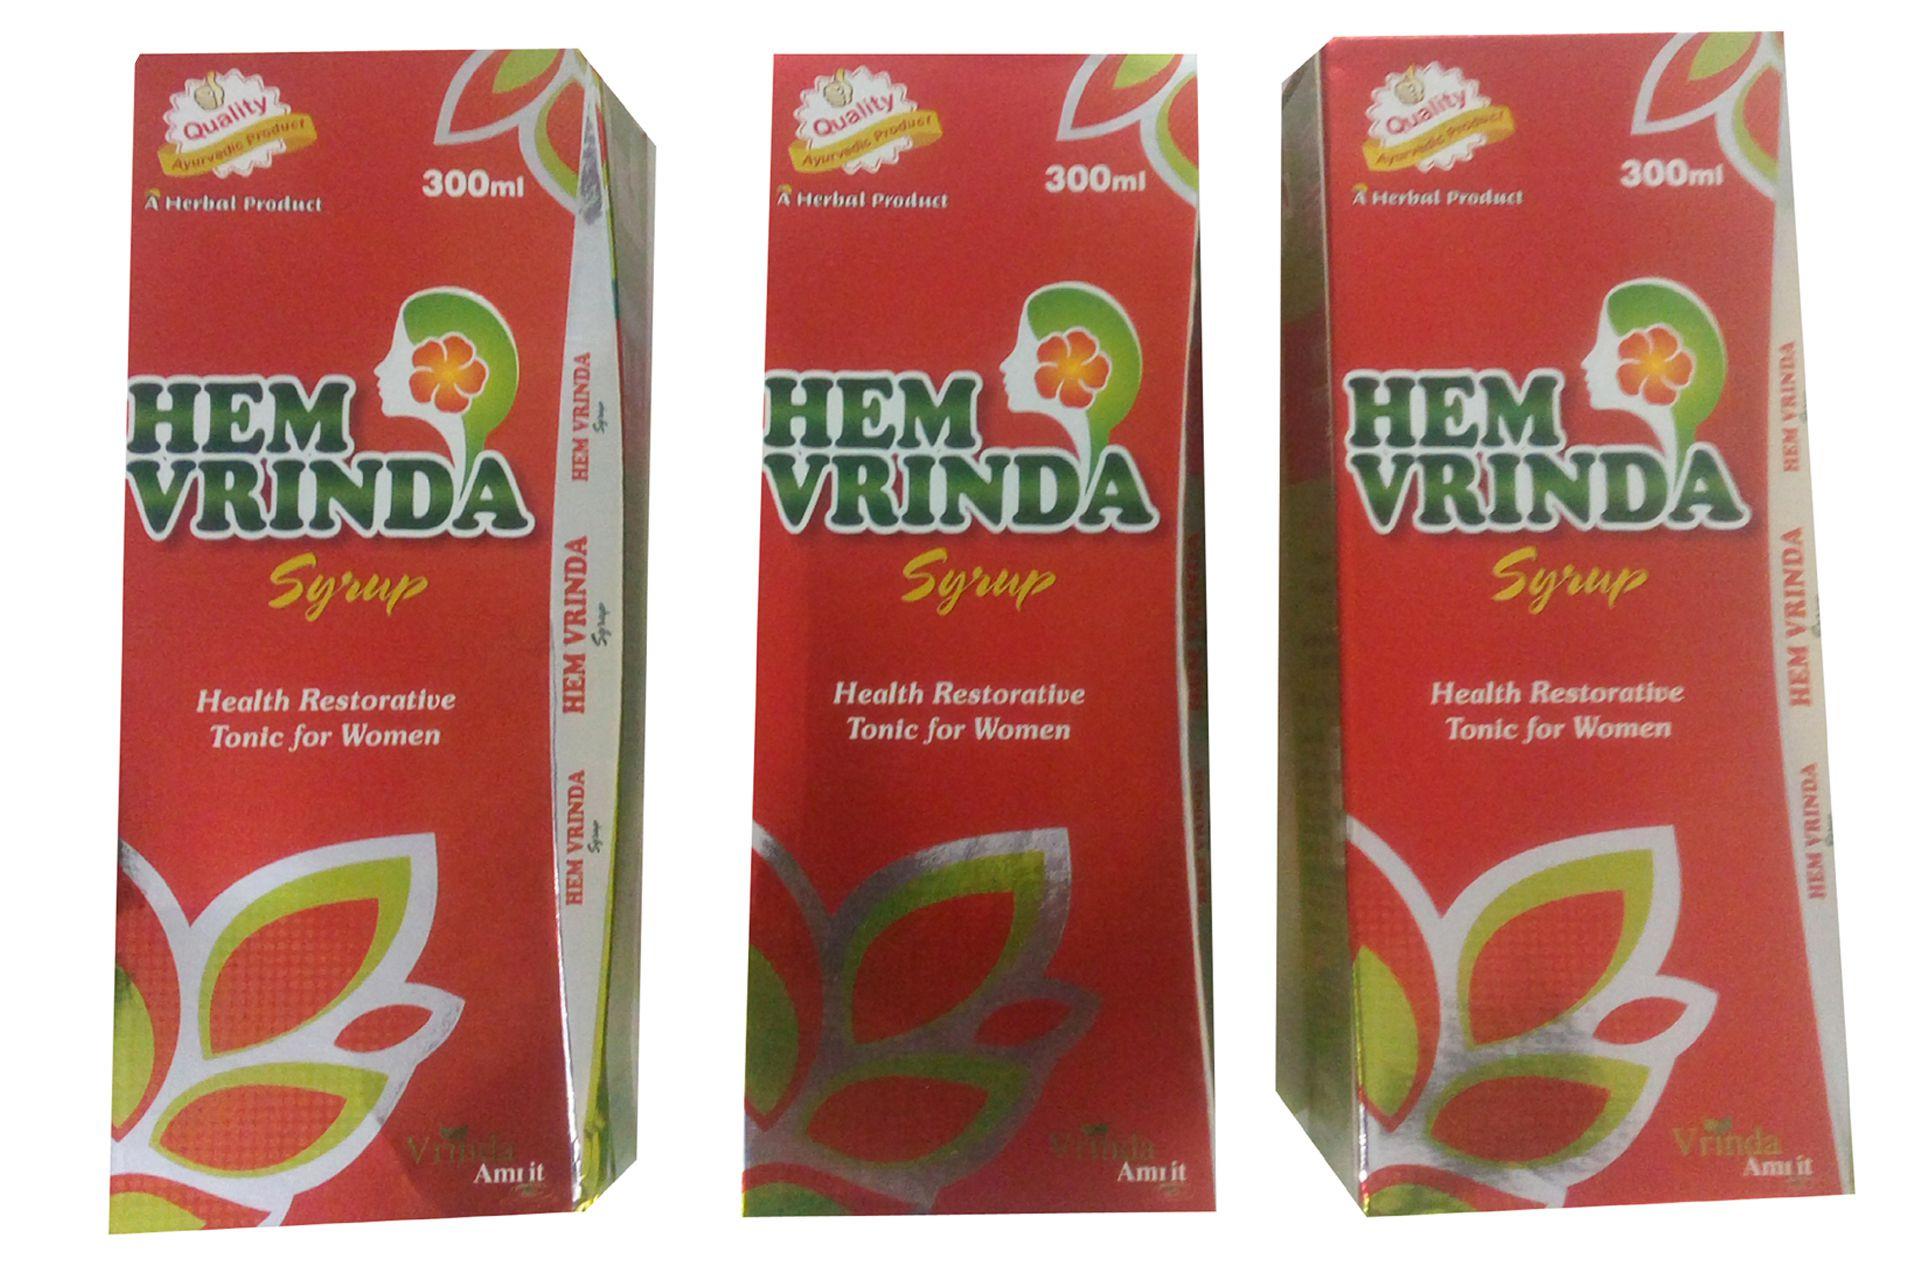 GOPAL LIFESCIENCE HEM VRINDA A PLETE WOMEN HEALTH TONIC Syrup 300 ml Pack of